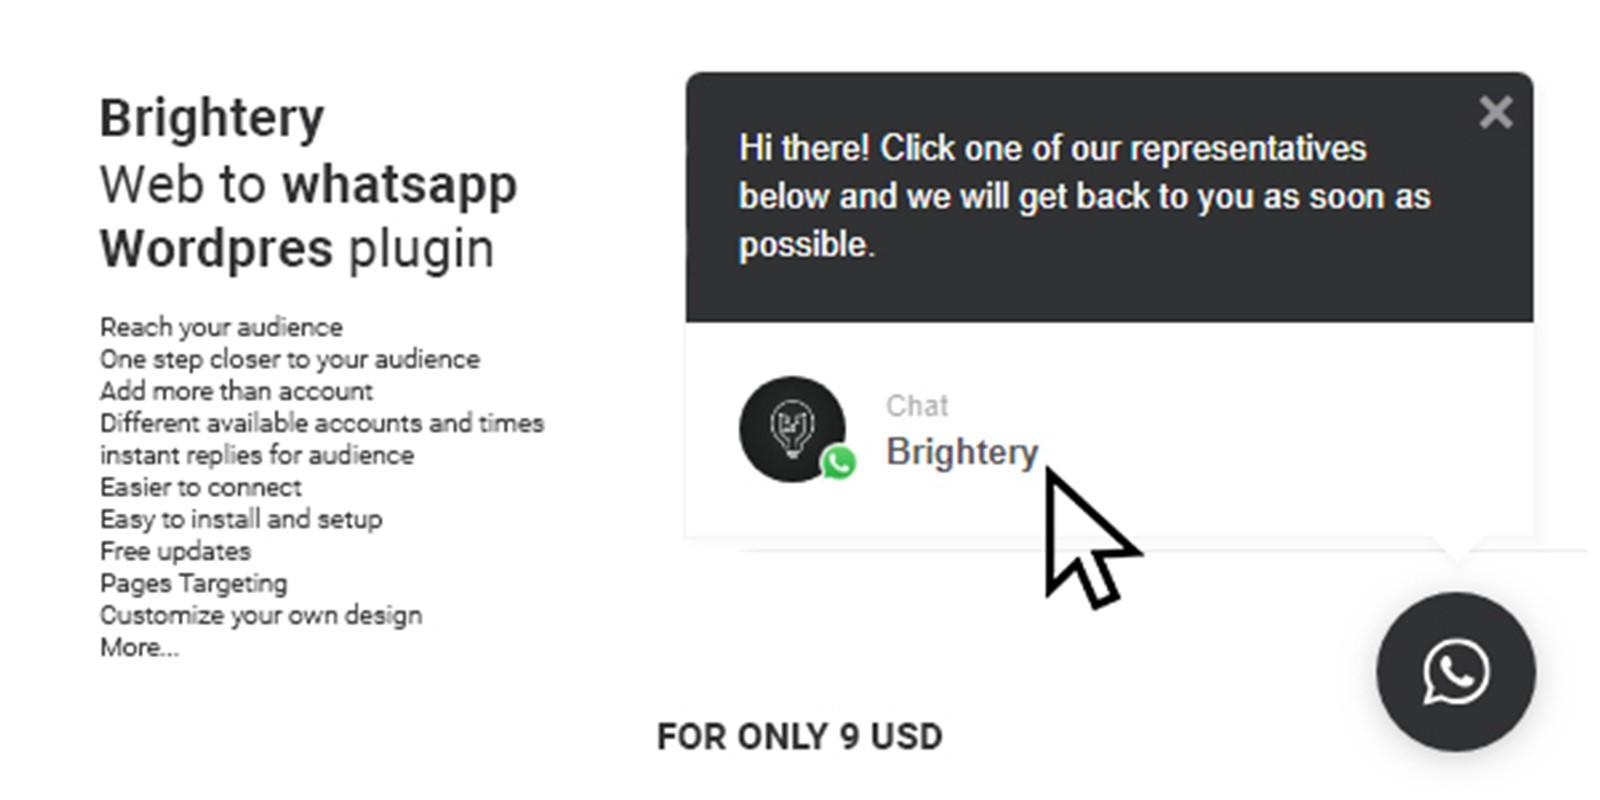 Brightery Web To WhatsApp Wordpress Plugin